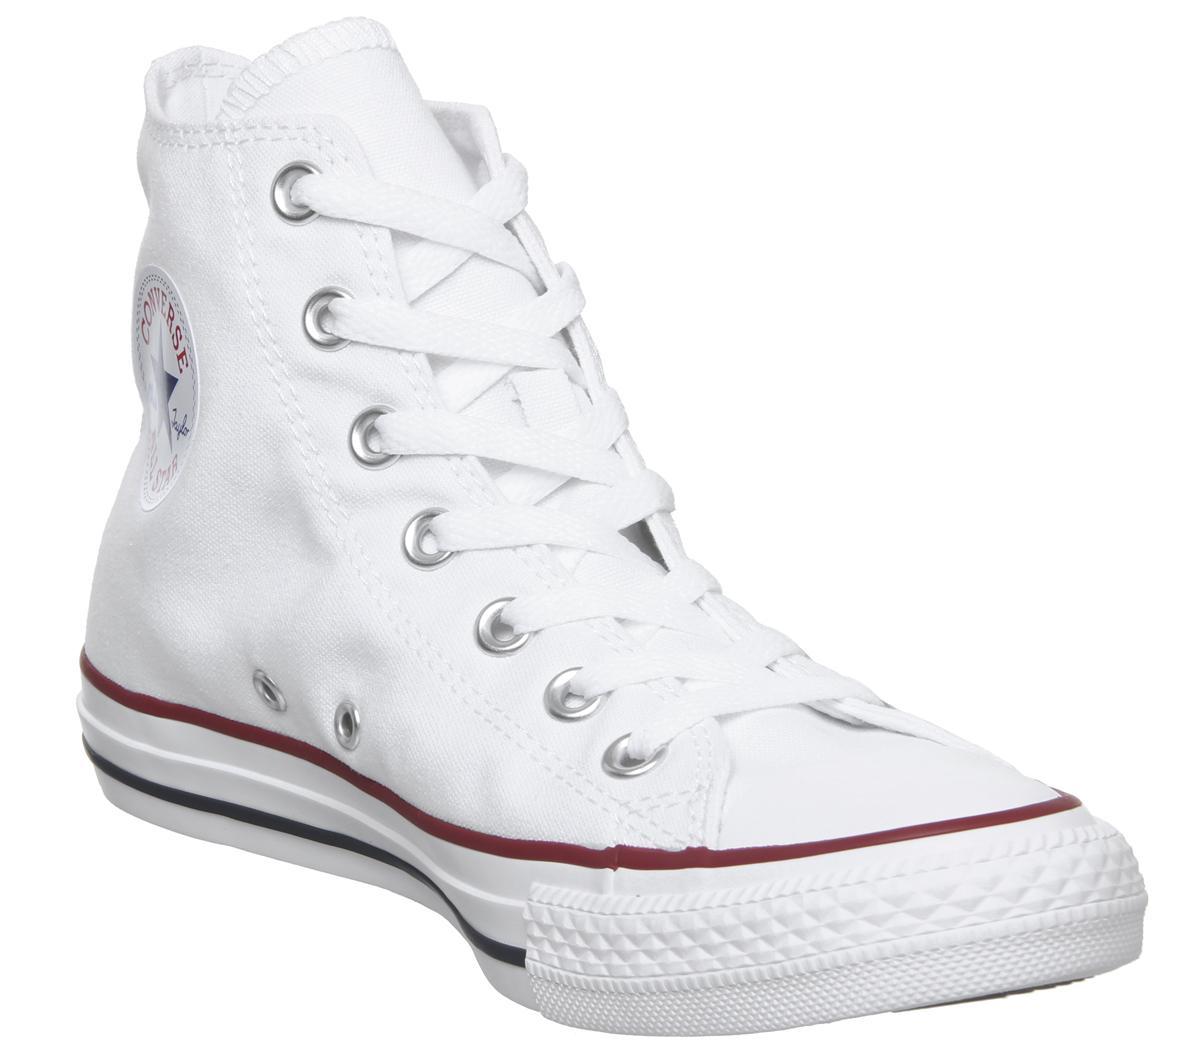 Converse Junior ALL STAR Hi Canvas White